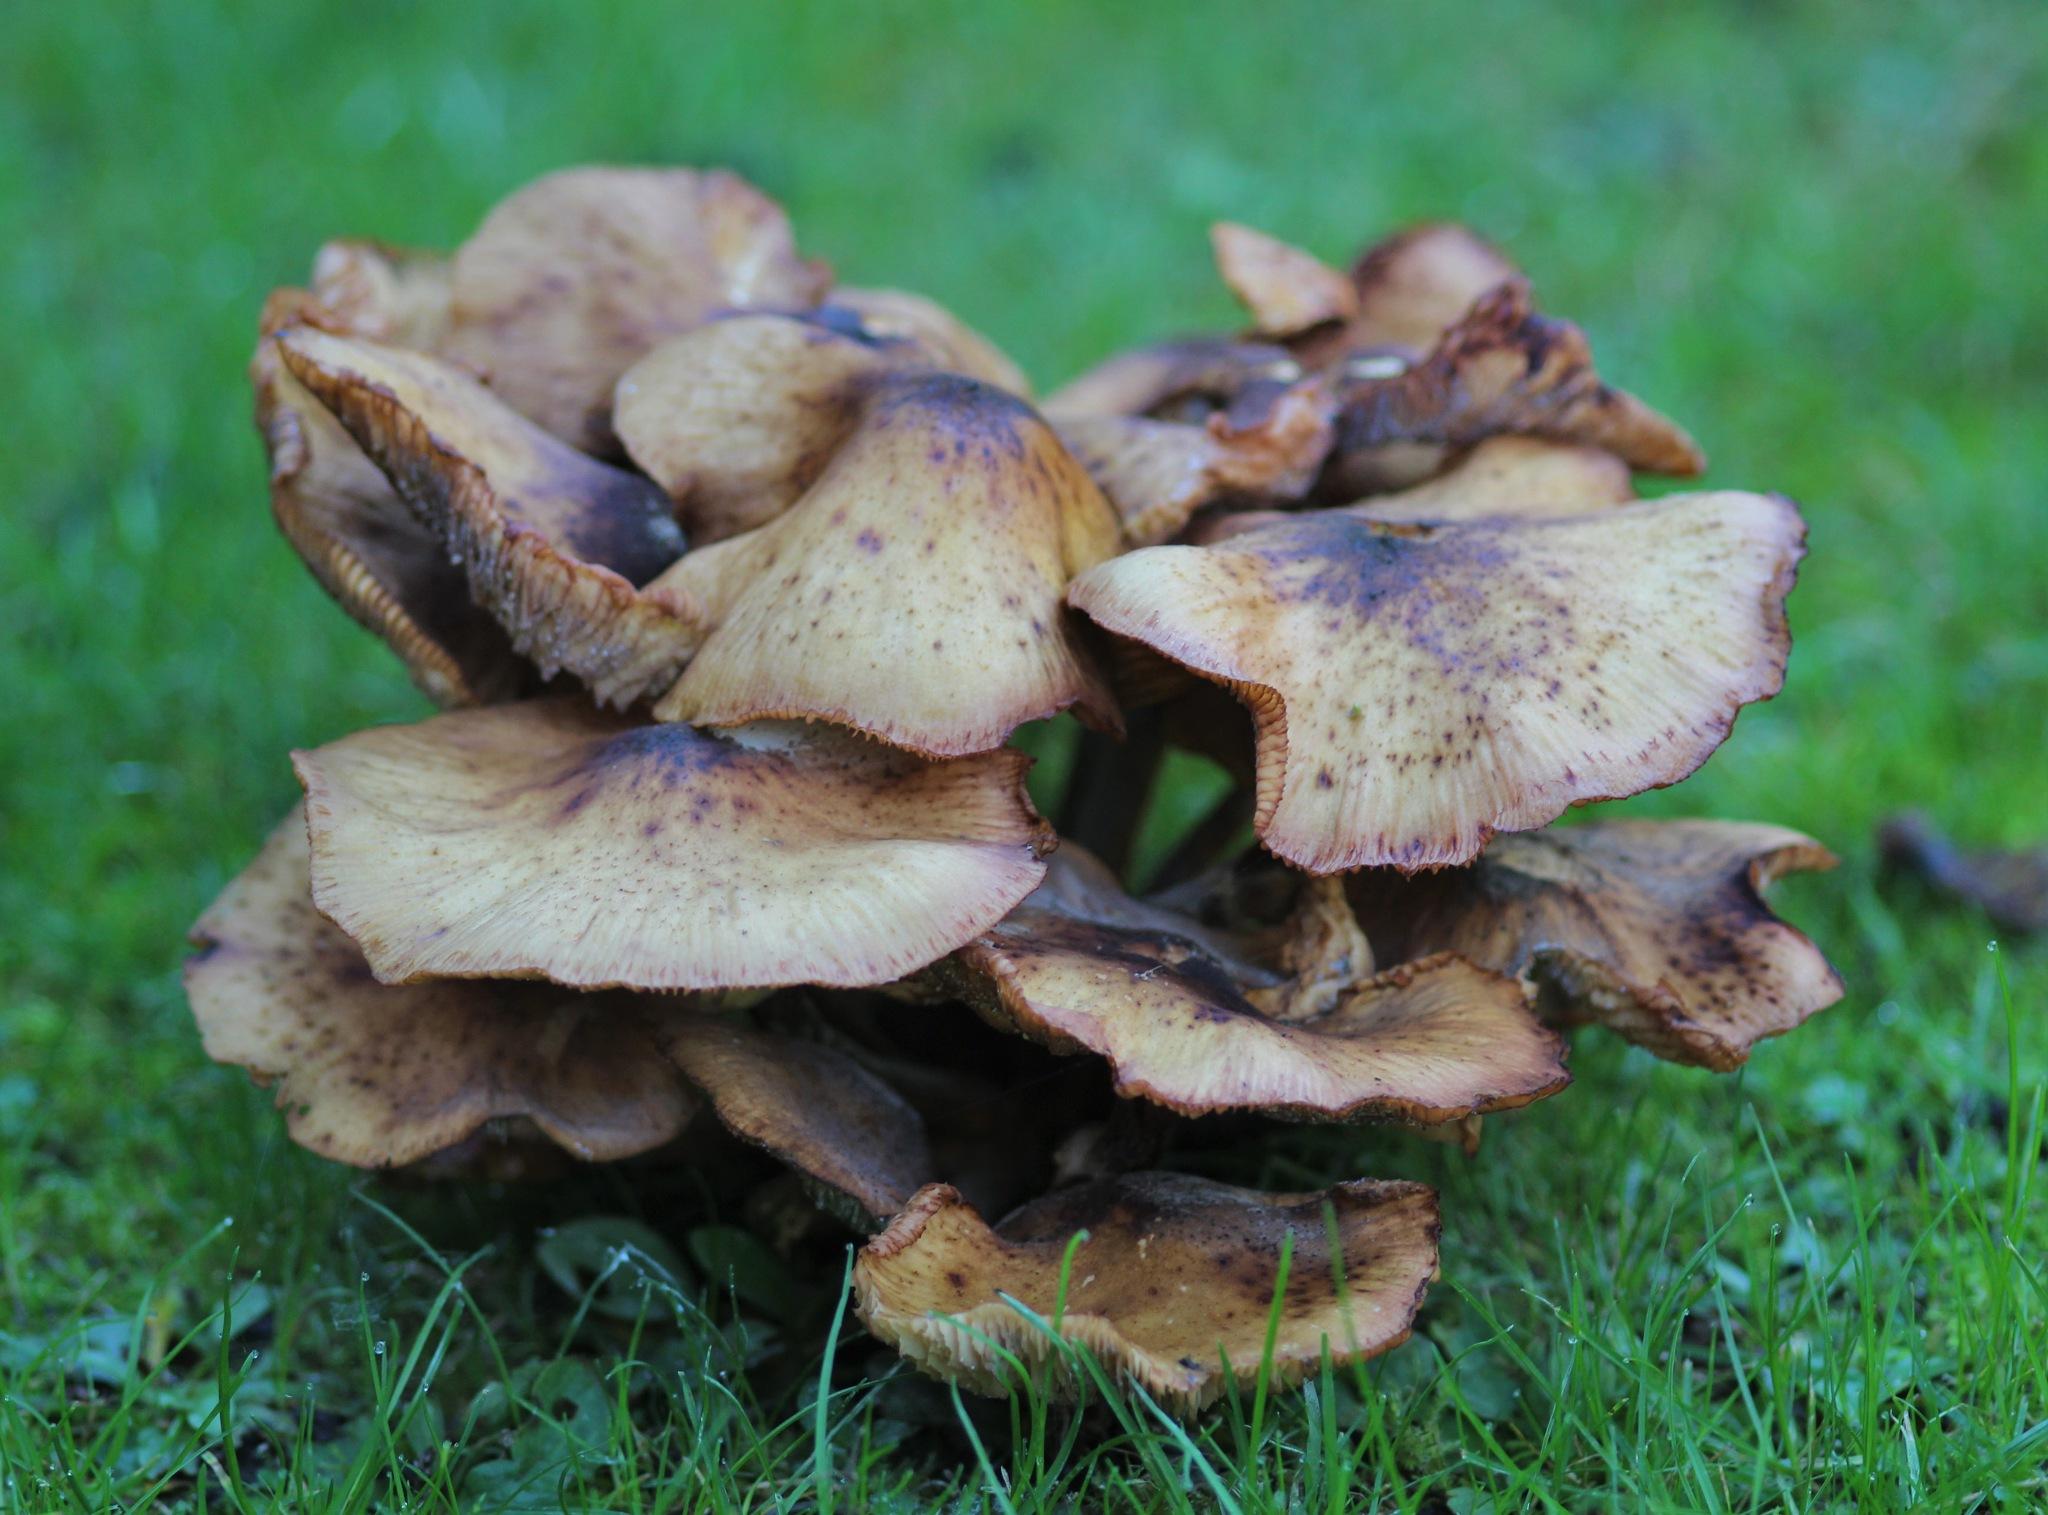 Autumn garden, wild mushrooms by alijhawkins